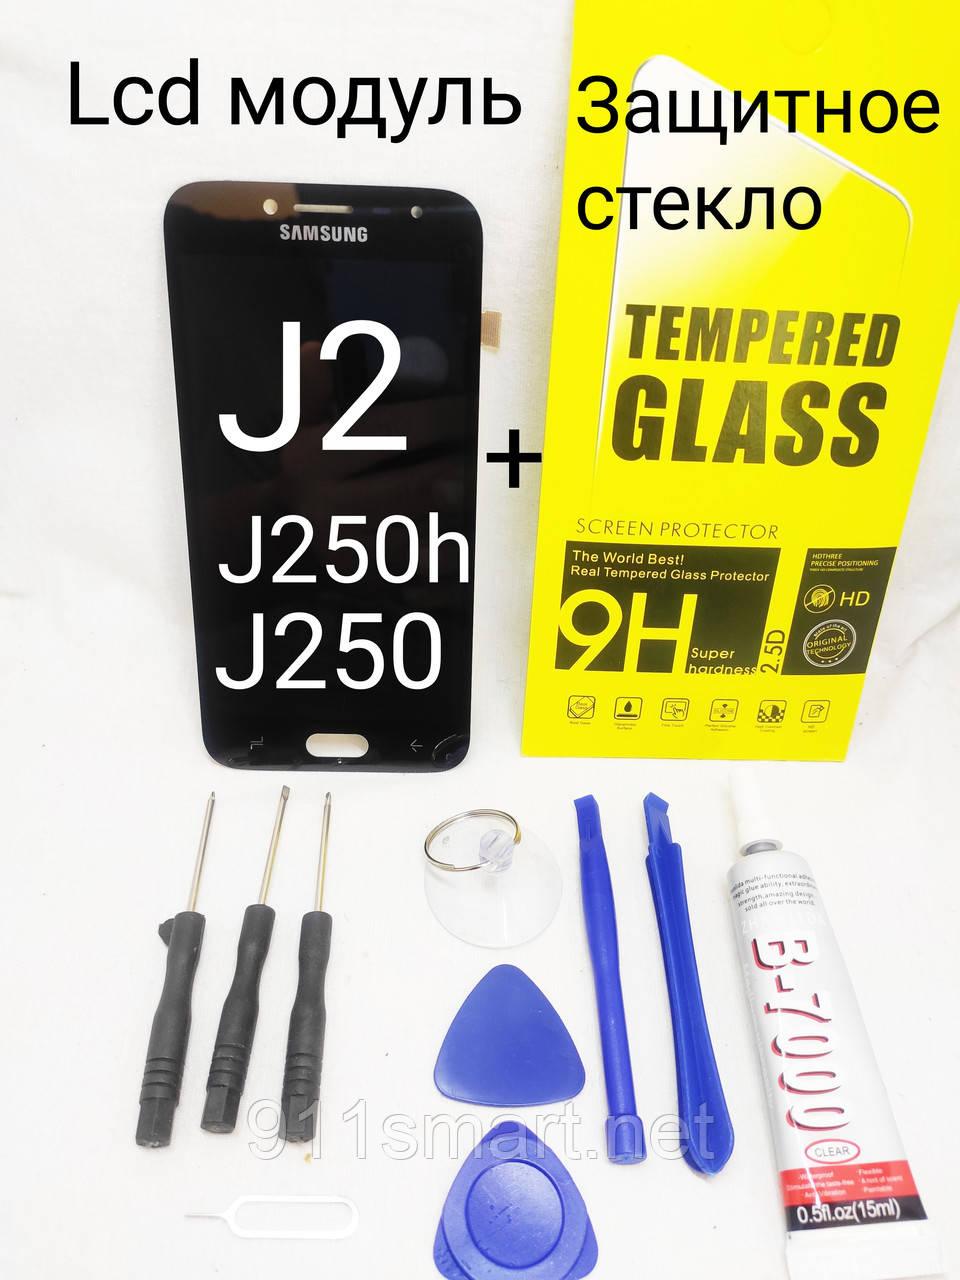 Дисплей, модуль, экран для Samsung Galaxy J2 Pro 2018, J250F / DS чёрный